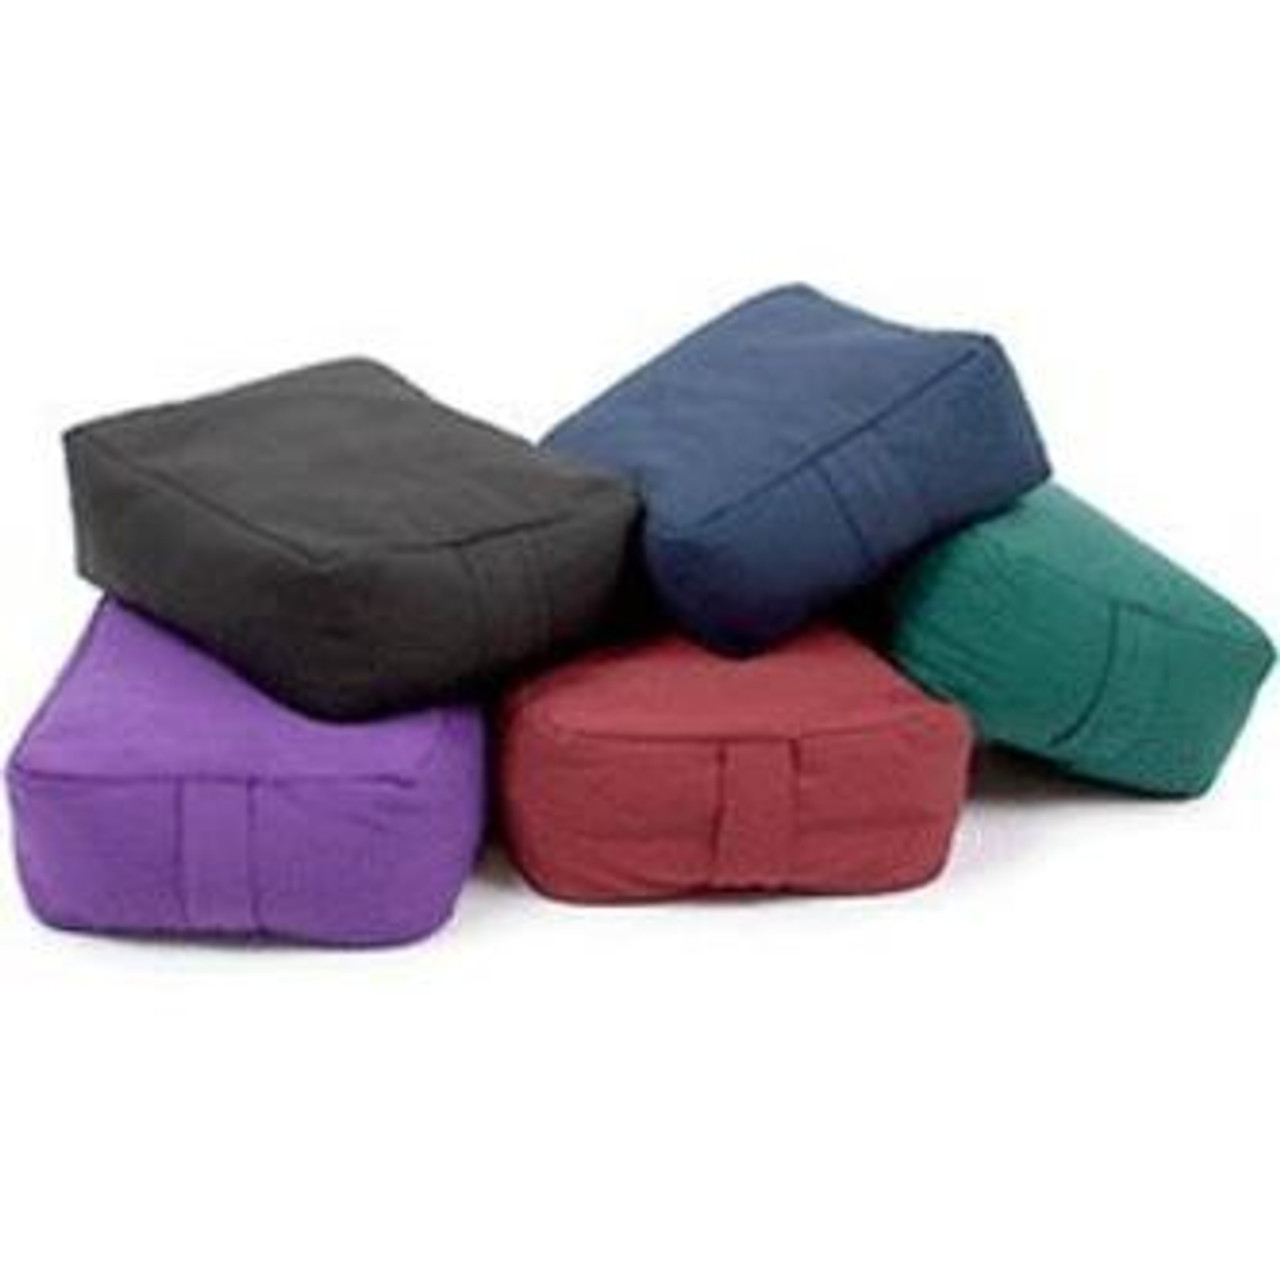 Cotton Rectangular Zen Meditation Cushion